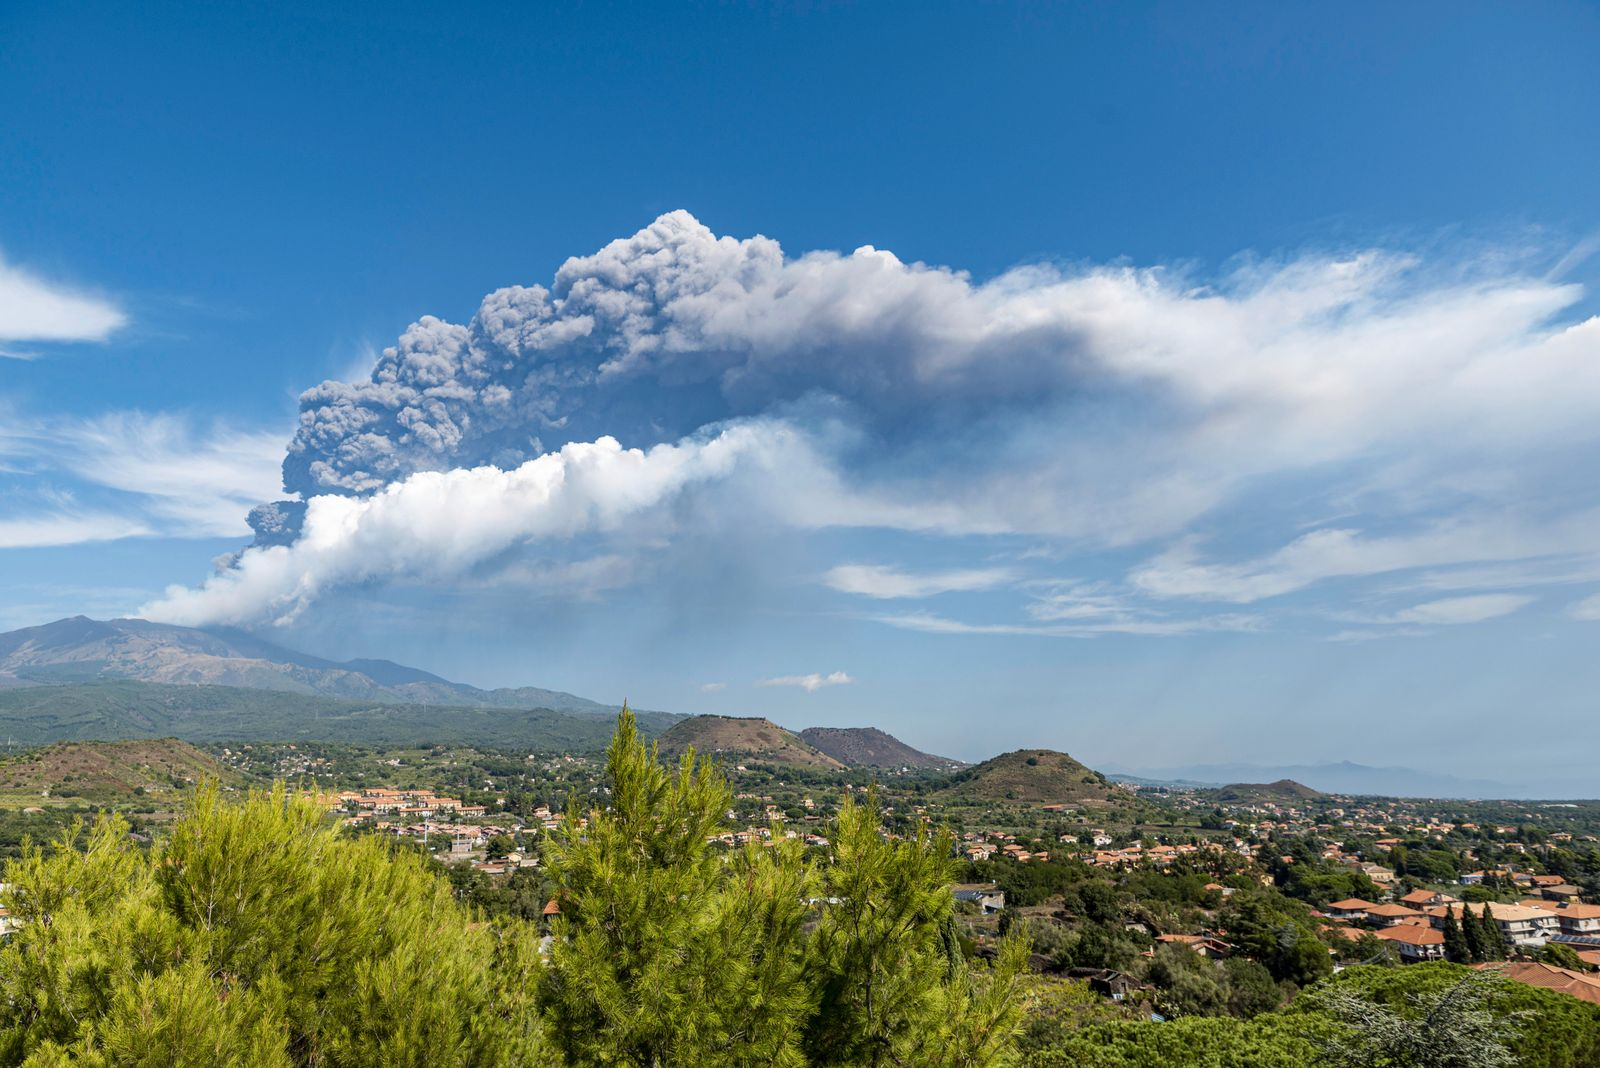 New eruption at Etna volcano